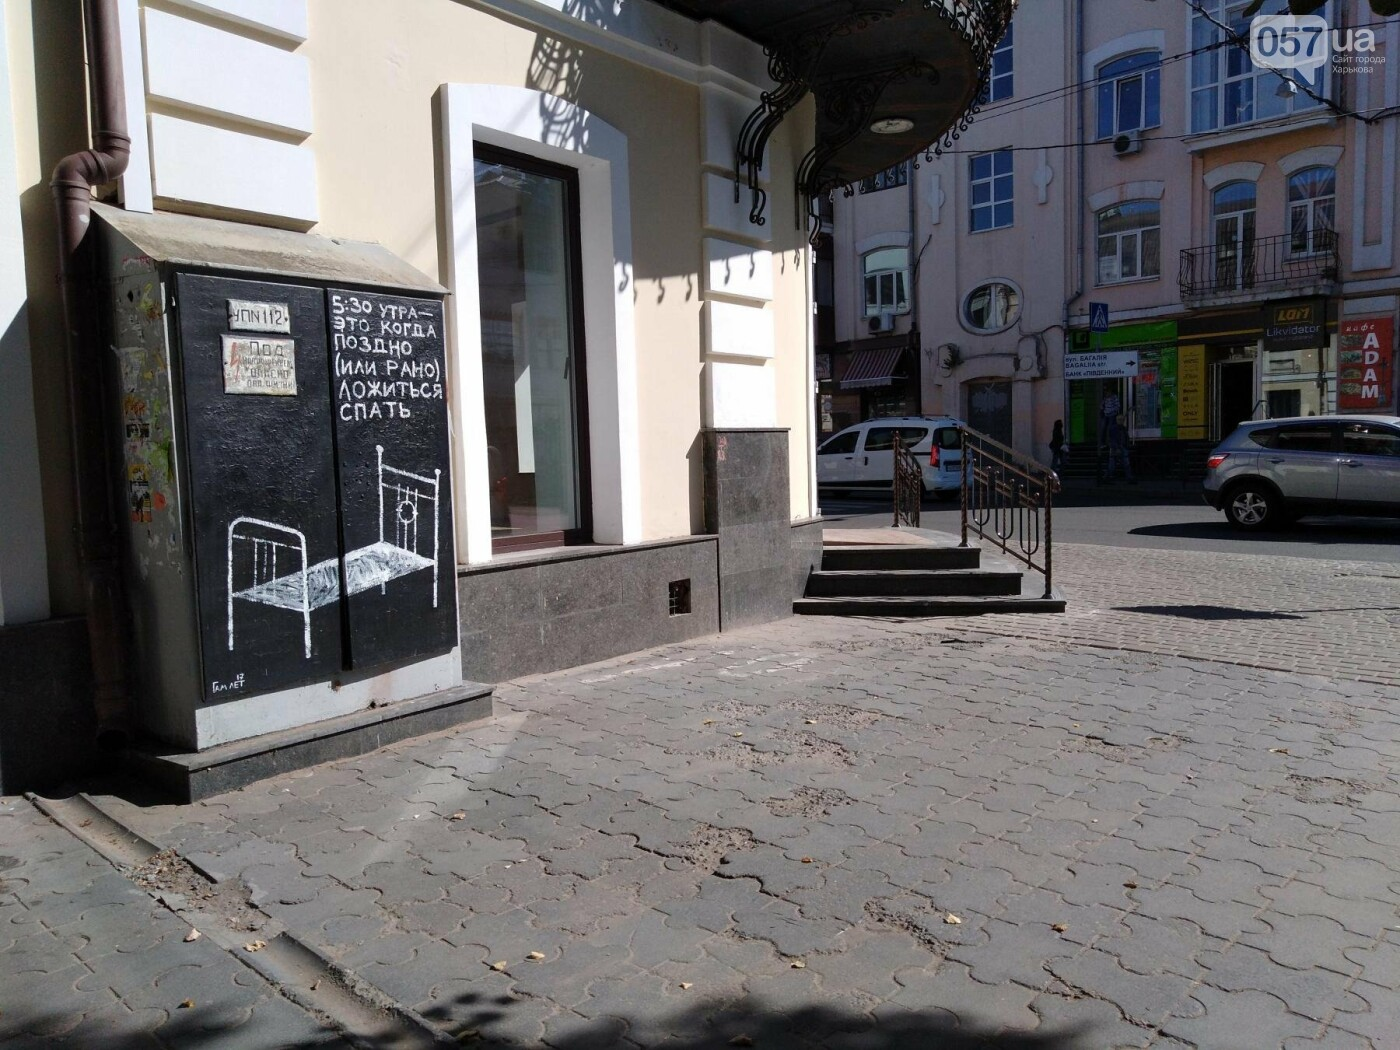 Стрит-арт Гамлета в Харькове: ТОП-10 граффити художника, - ФОТО, фото-16